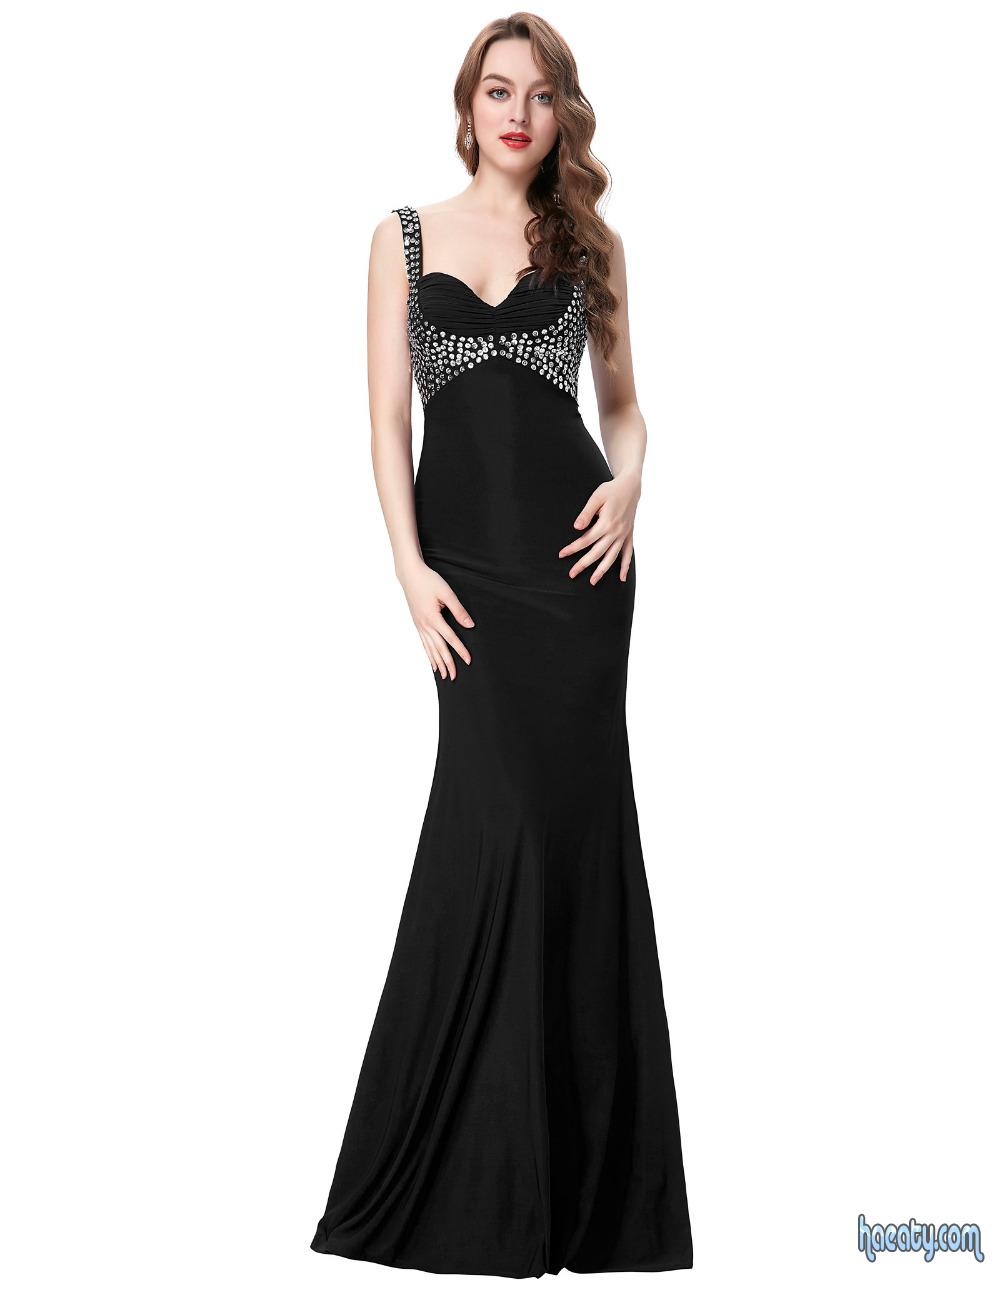 Evening Dresses 2018 1469812147783.jpg